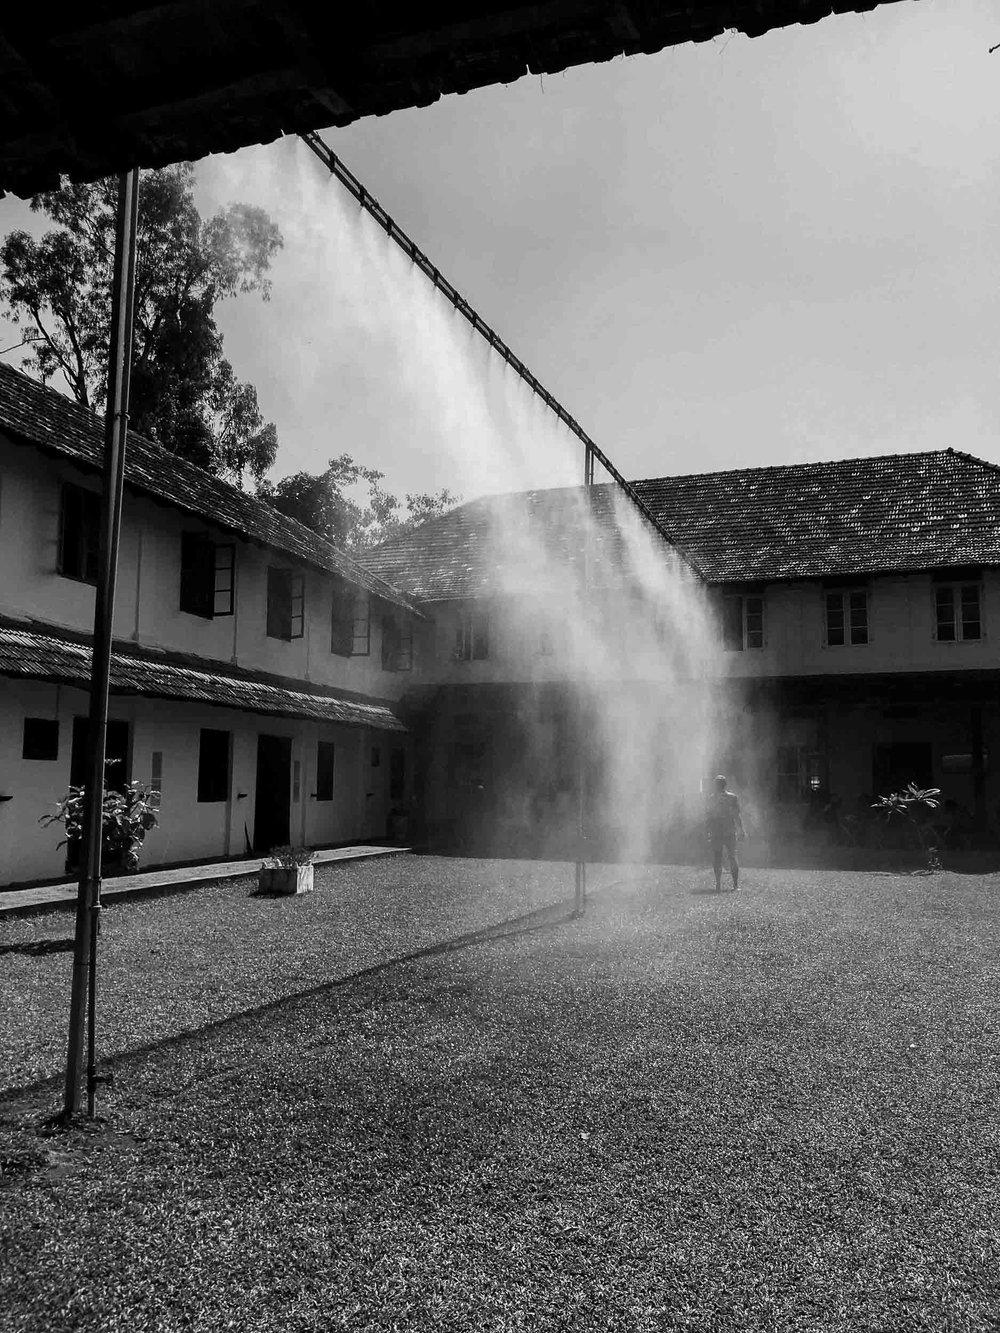 Sindhur_Photography_Kochi Muziris Biennale -2019-35.JPG